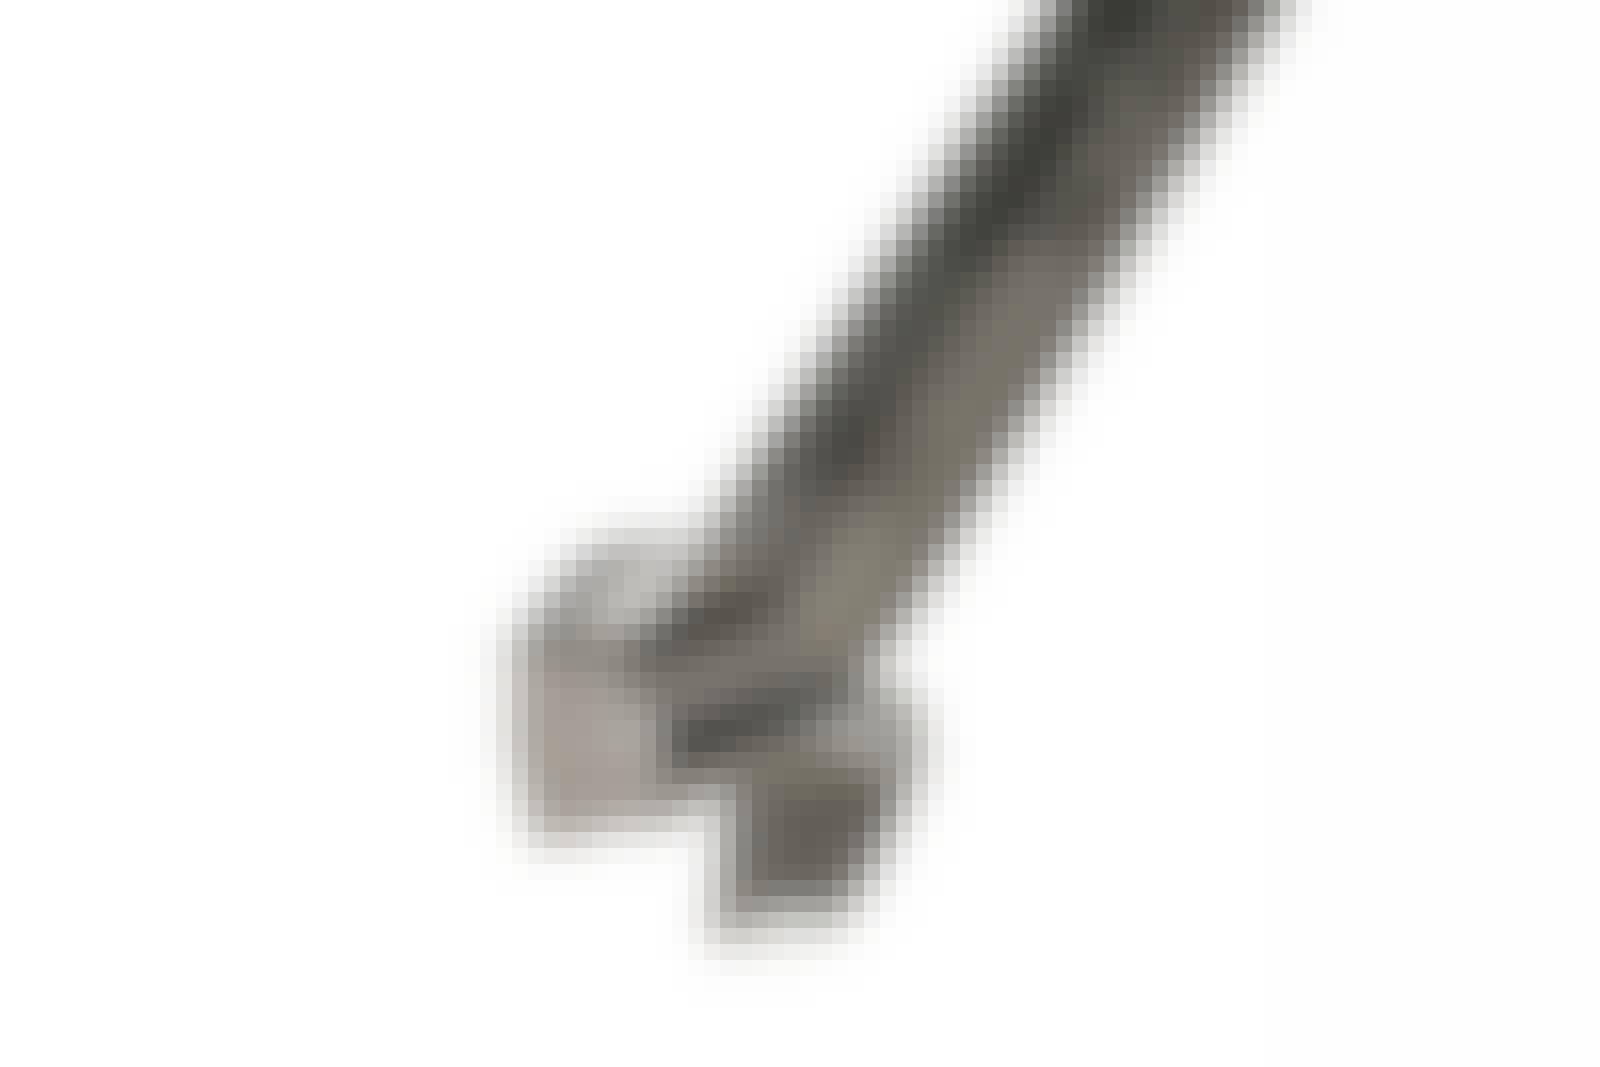 Sylinderbor: Sylinderbor i forskjellige størrelser